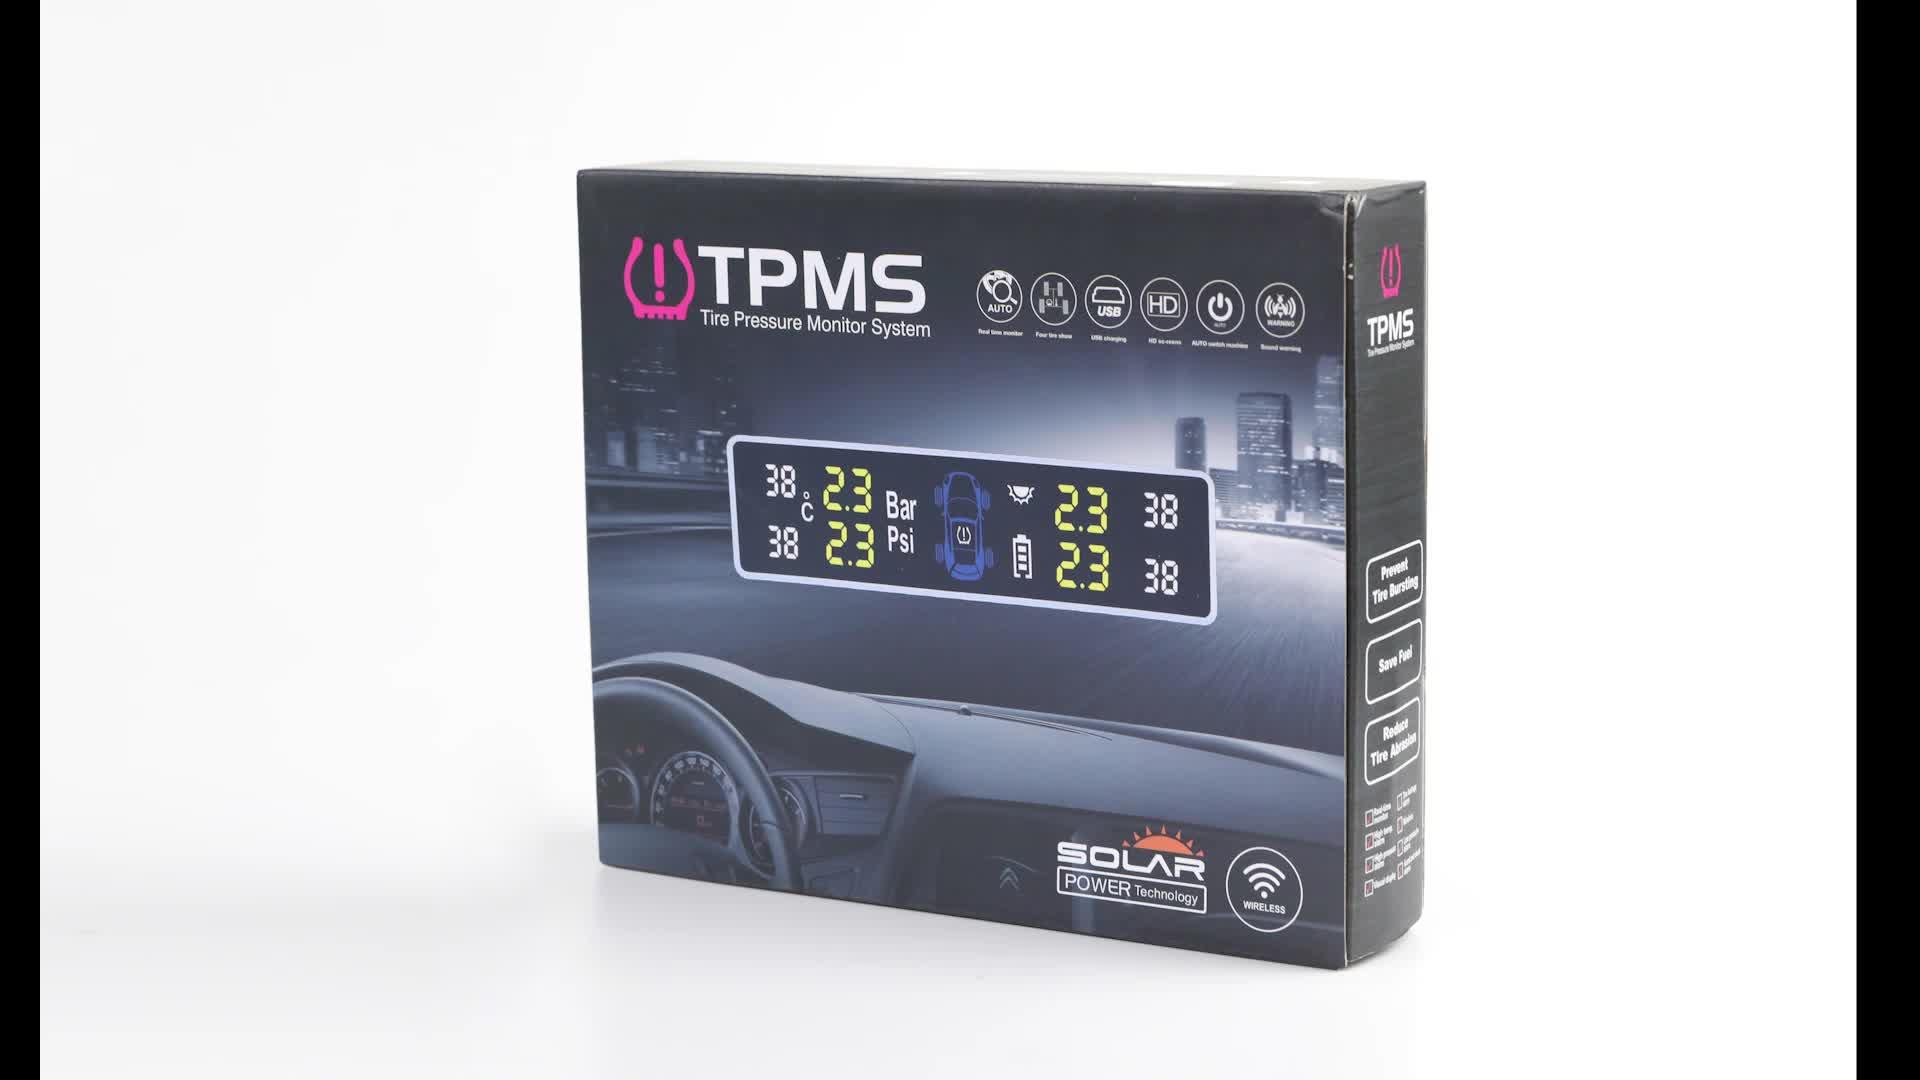 2019 Groothandel TPMS T85 zonne-energie bandenspanningscontrolesysteem digitale bandenspanningsmeter voor auto's